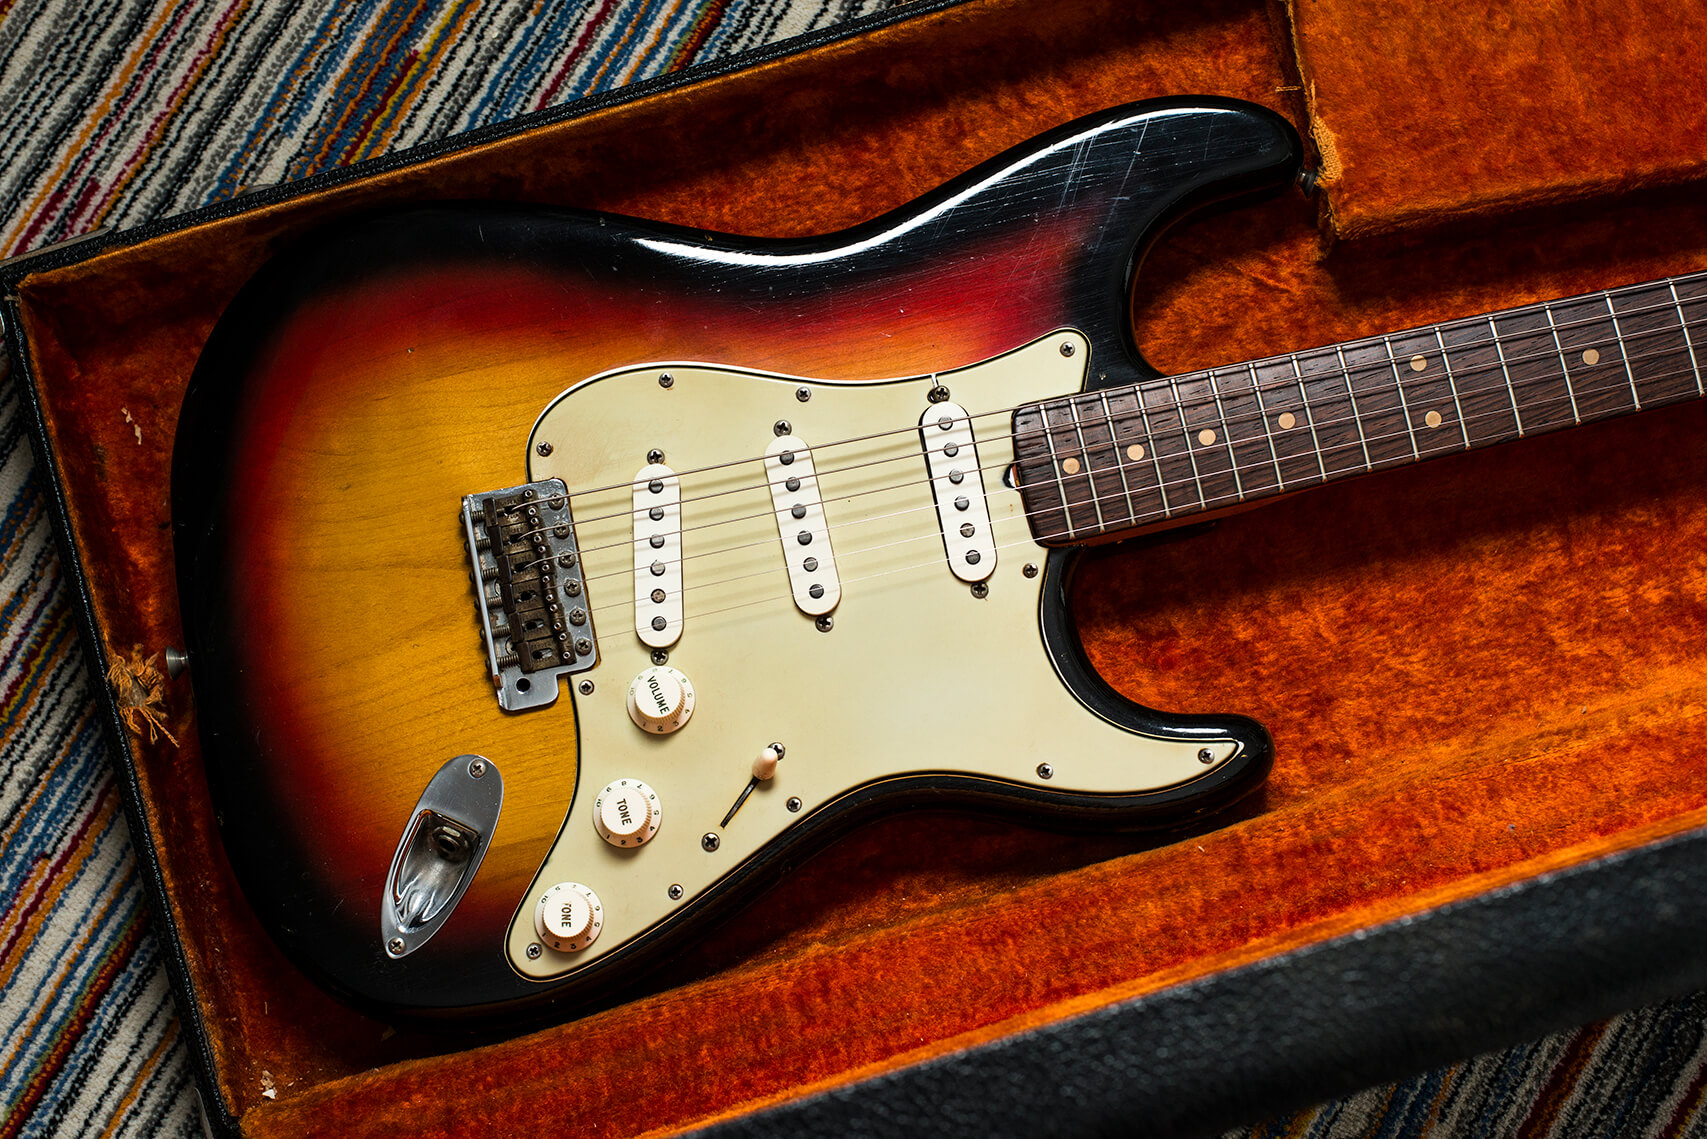 Jeff Garlin's 1964 Stratocaster Body